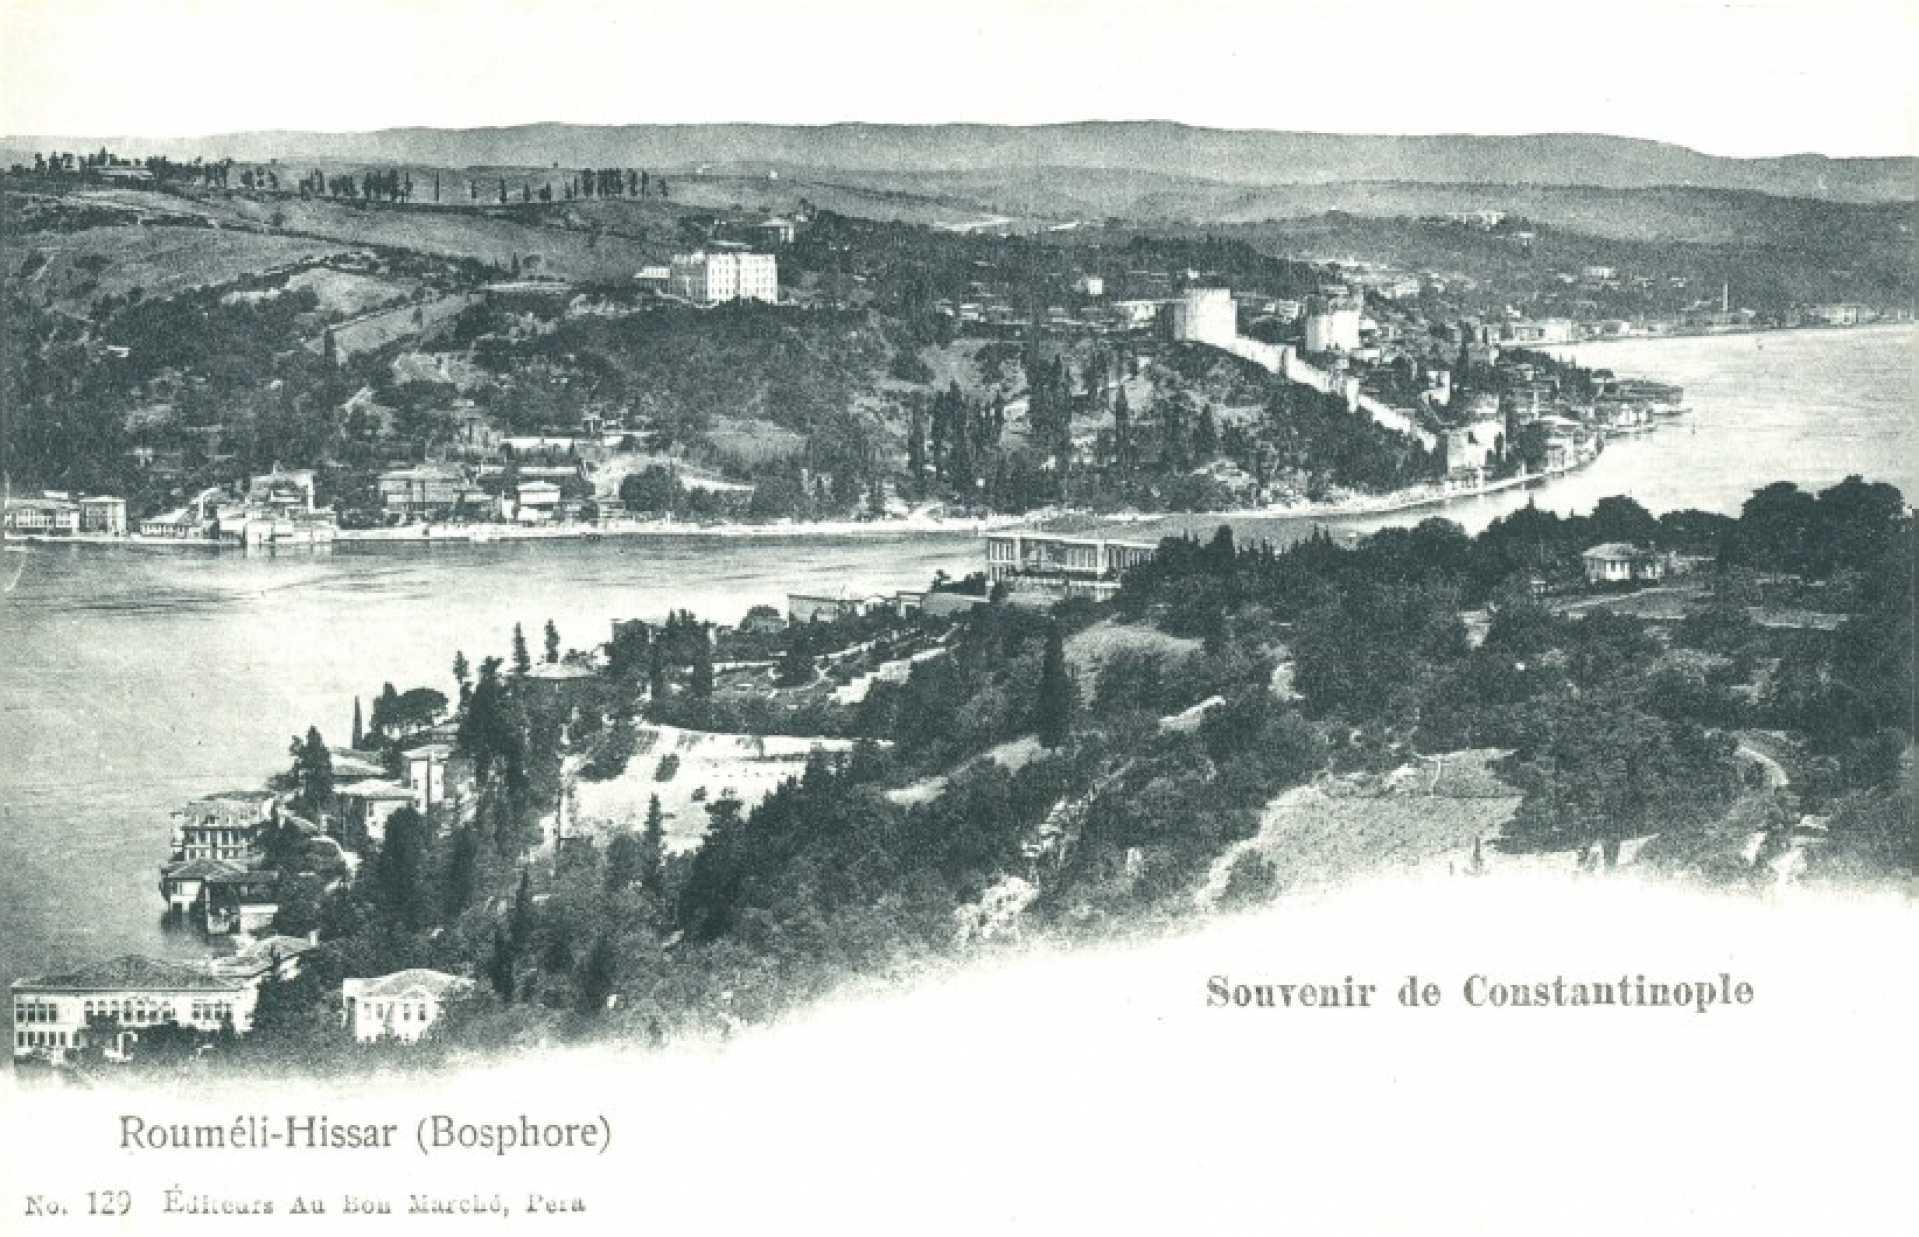 Roumeli-Hissar (Bosphore)